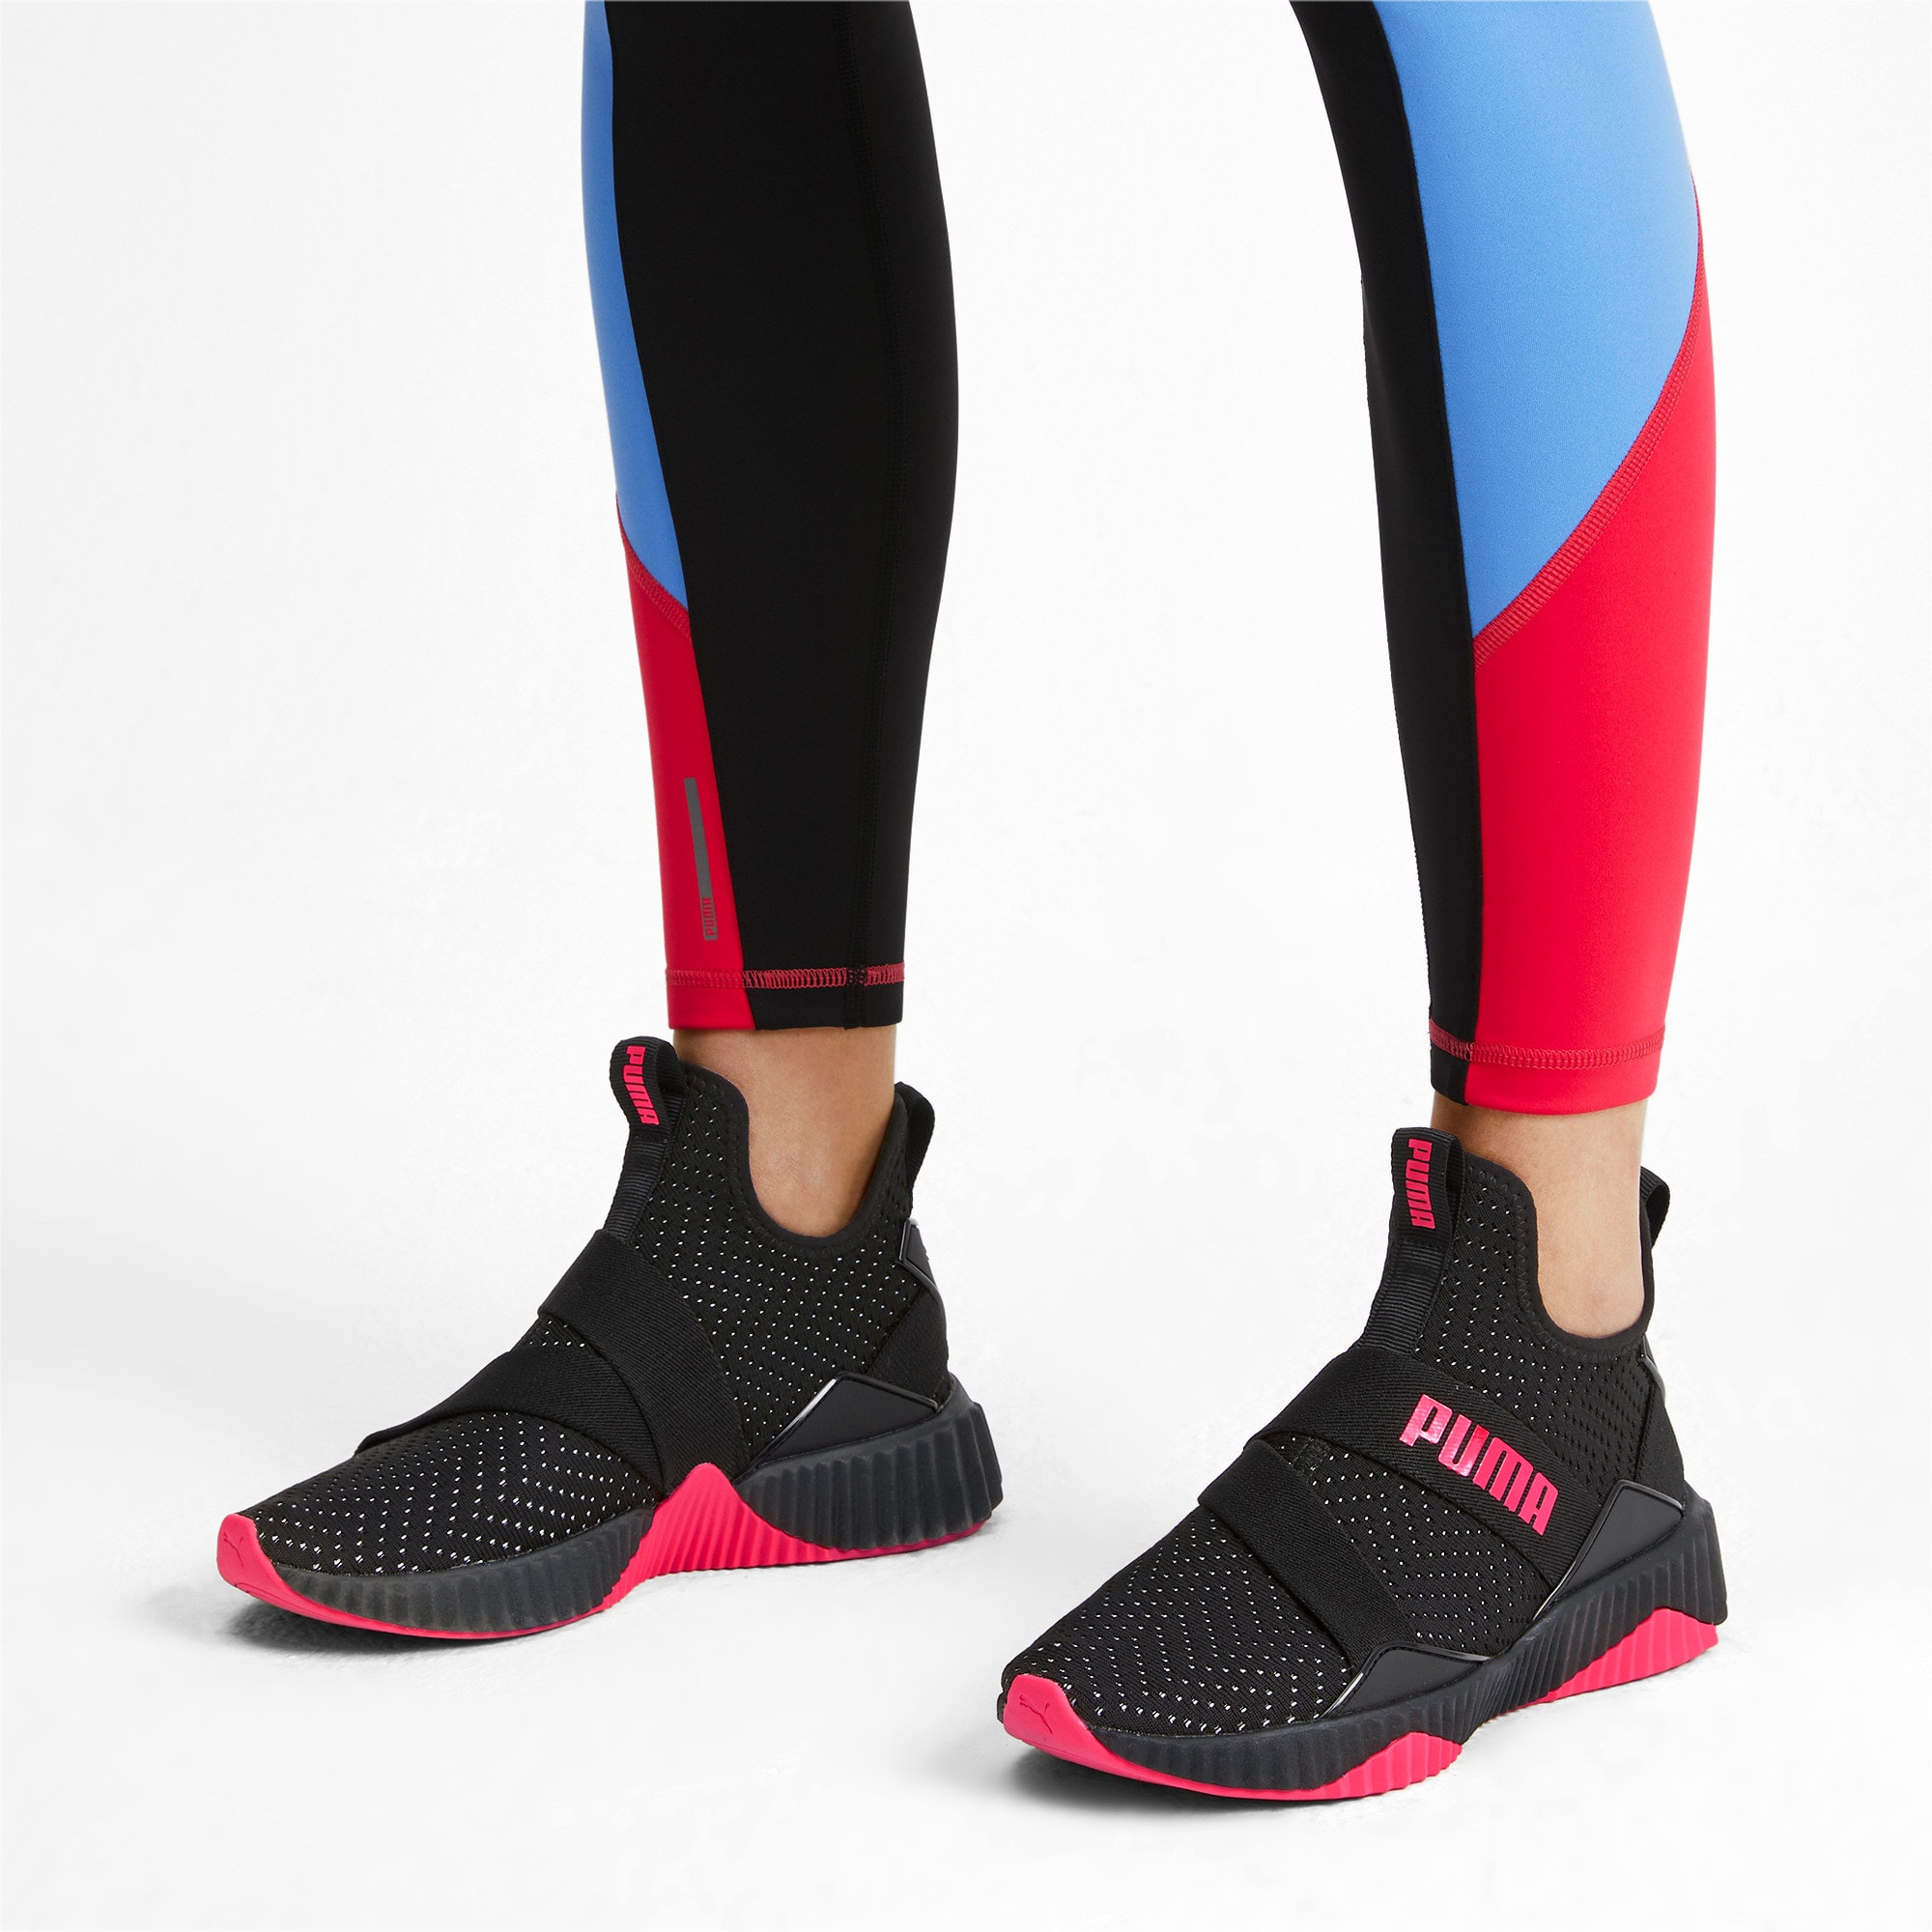 Thumbnail 2 of Defy Mid Core Women's Trainers, Puma Black-Pink Alert, medium-IND